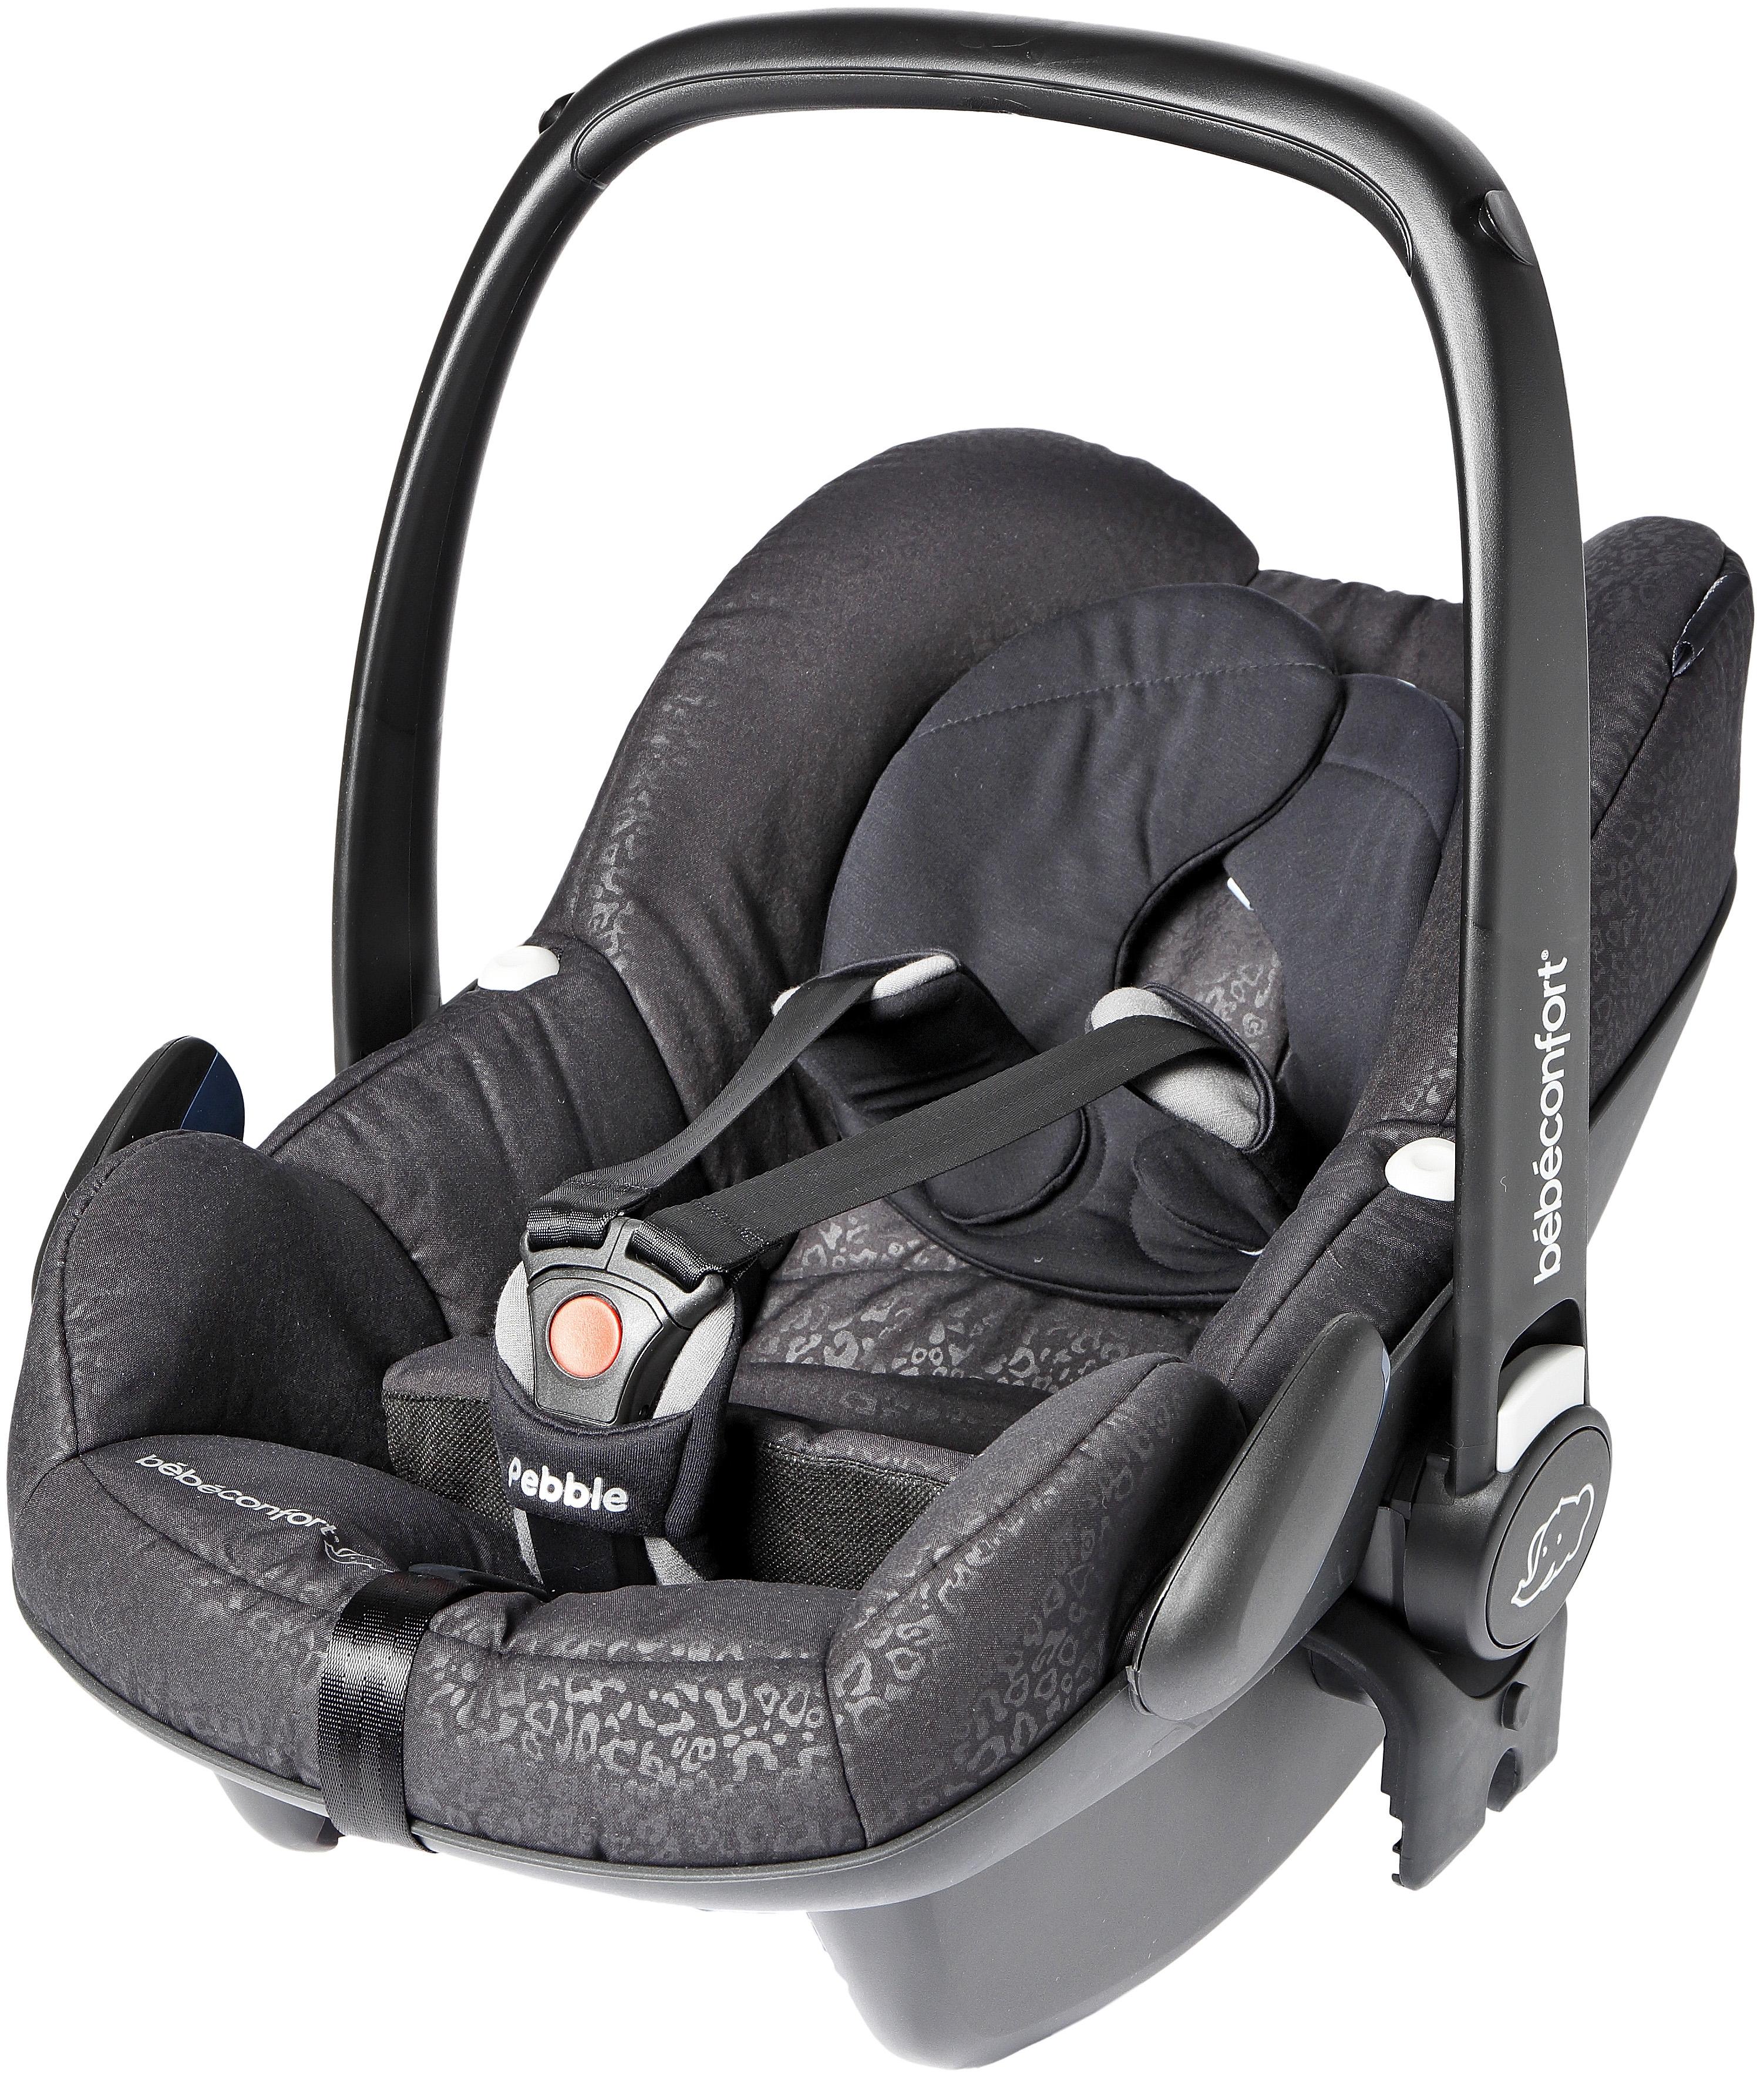 An lisis de bebe confort pebble comparador de sillas de coche ocu - Sillas de coche bebe confort ...